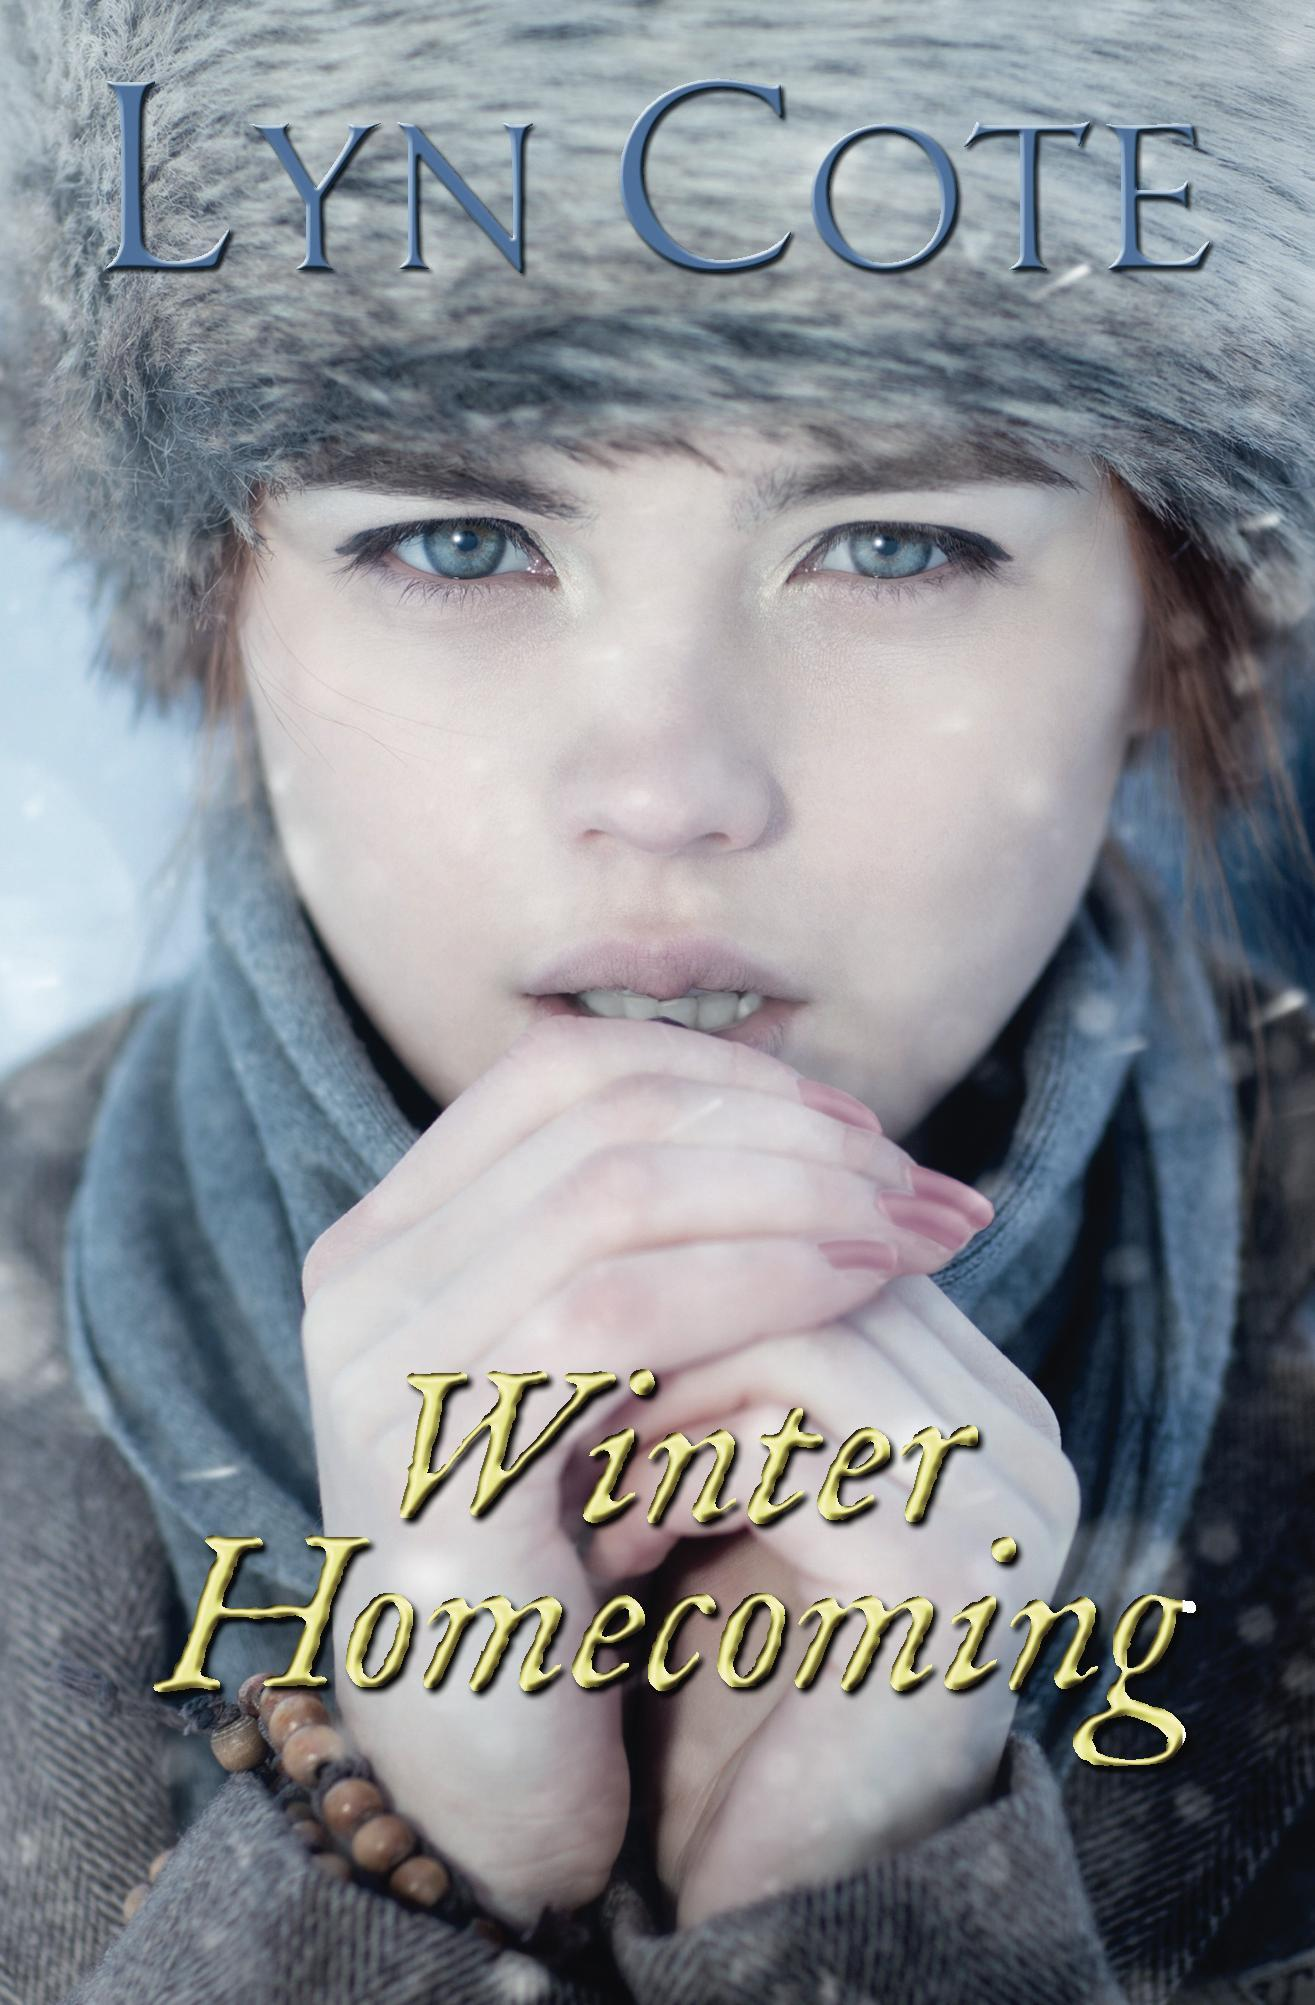 Winter Homecoming: Sophias Daughter Lyn Cote